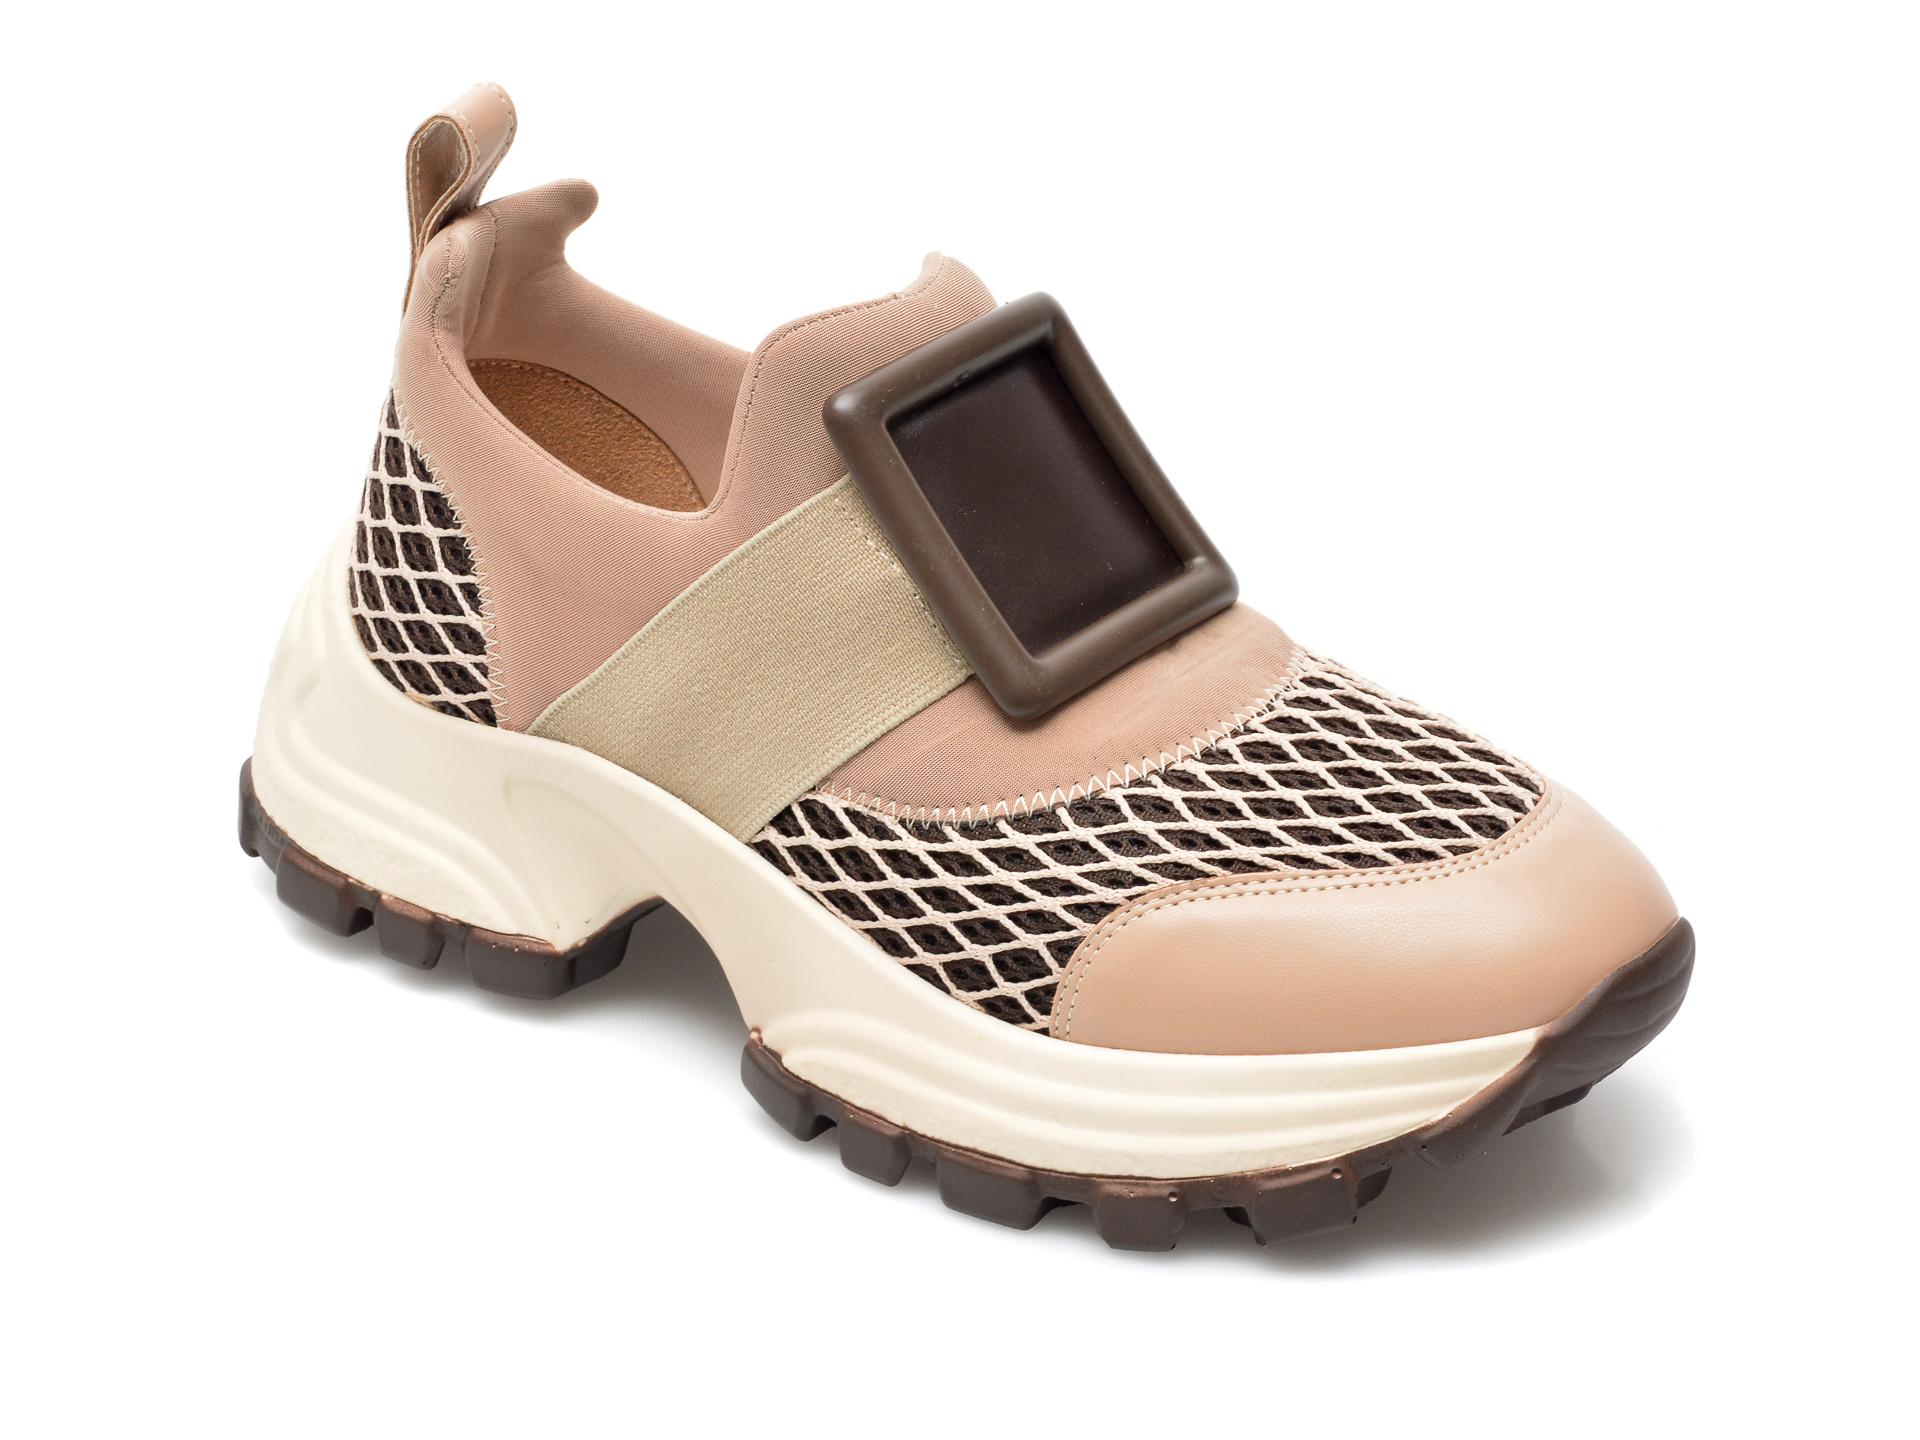 Pantofi Sport Gryxx Nude, Mo12410, Din Material Textil Si Piele Ecologica